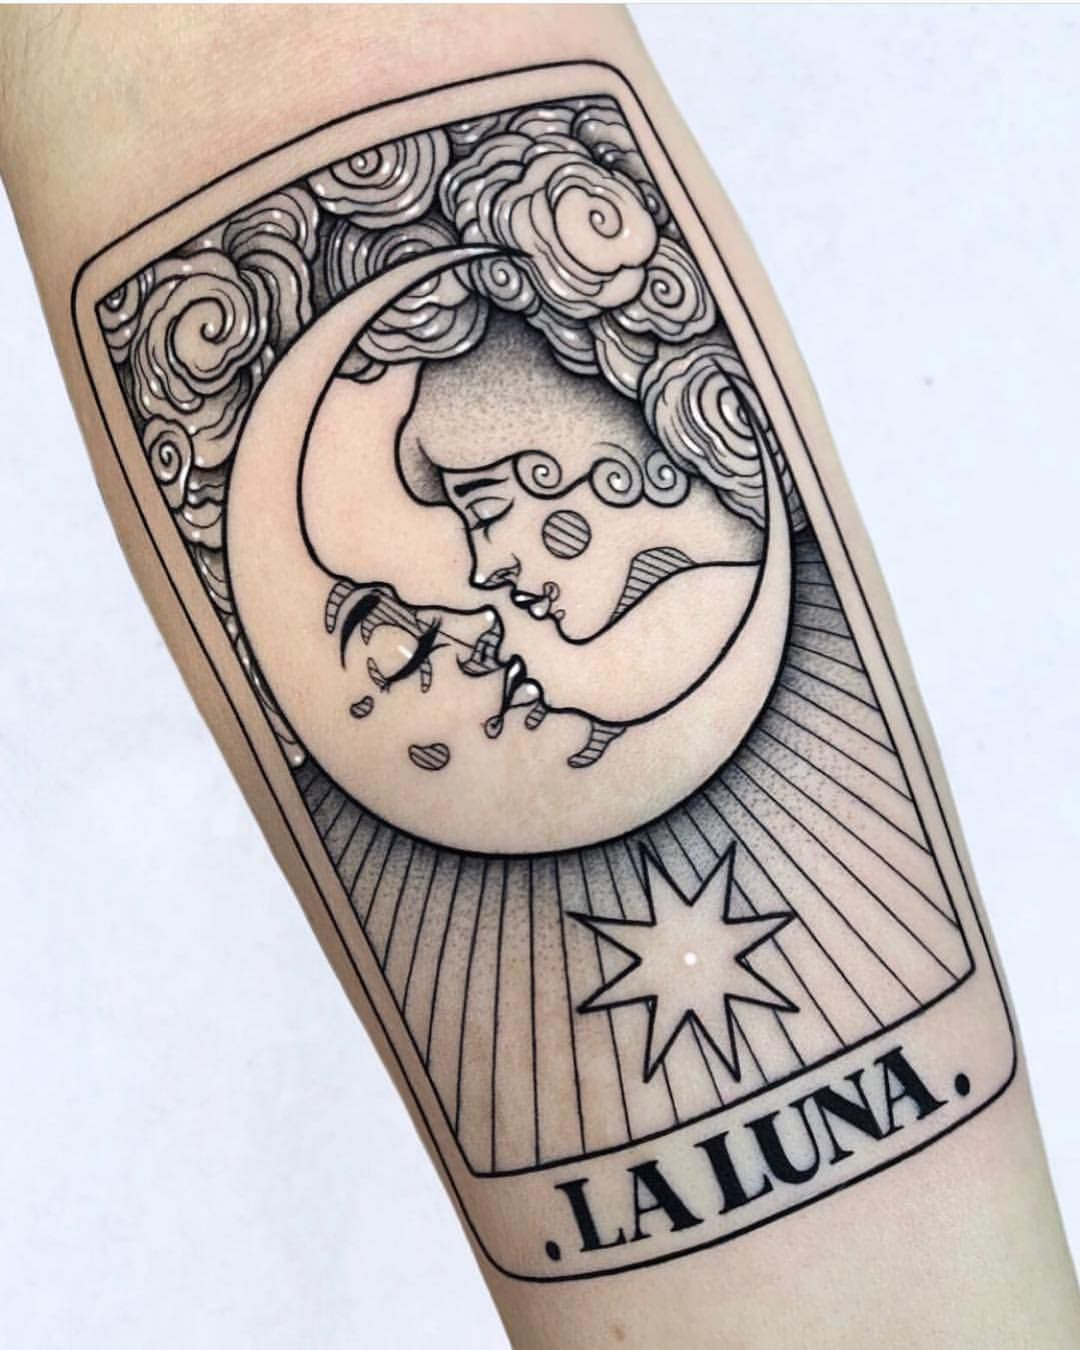 #Tattoo #Tattoos #Resident - Bonjour #Barcelona #Espagne #Tattoo #Tattoos #Resident - Bonjour #Barcelona #Espagne #tatouagesminimes #tatouagesdejambes